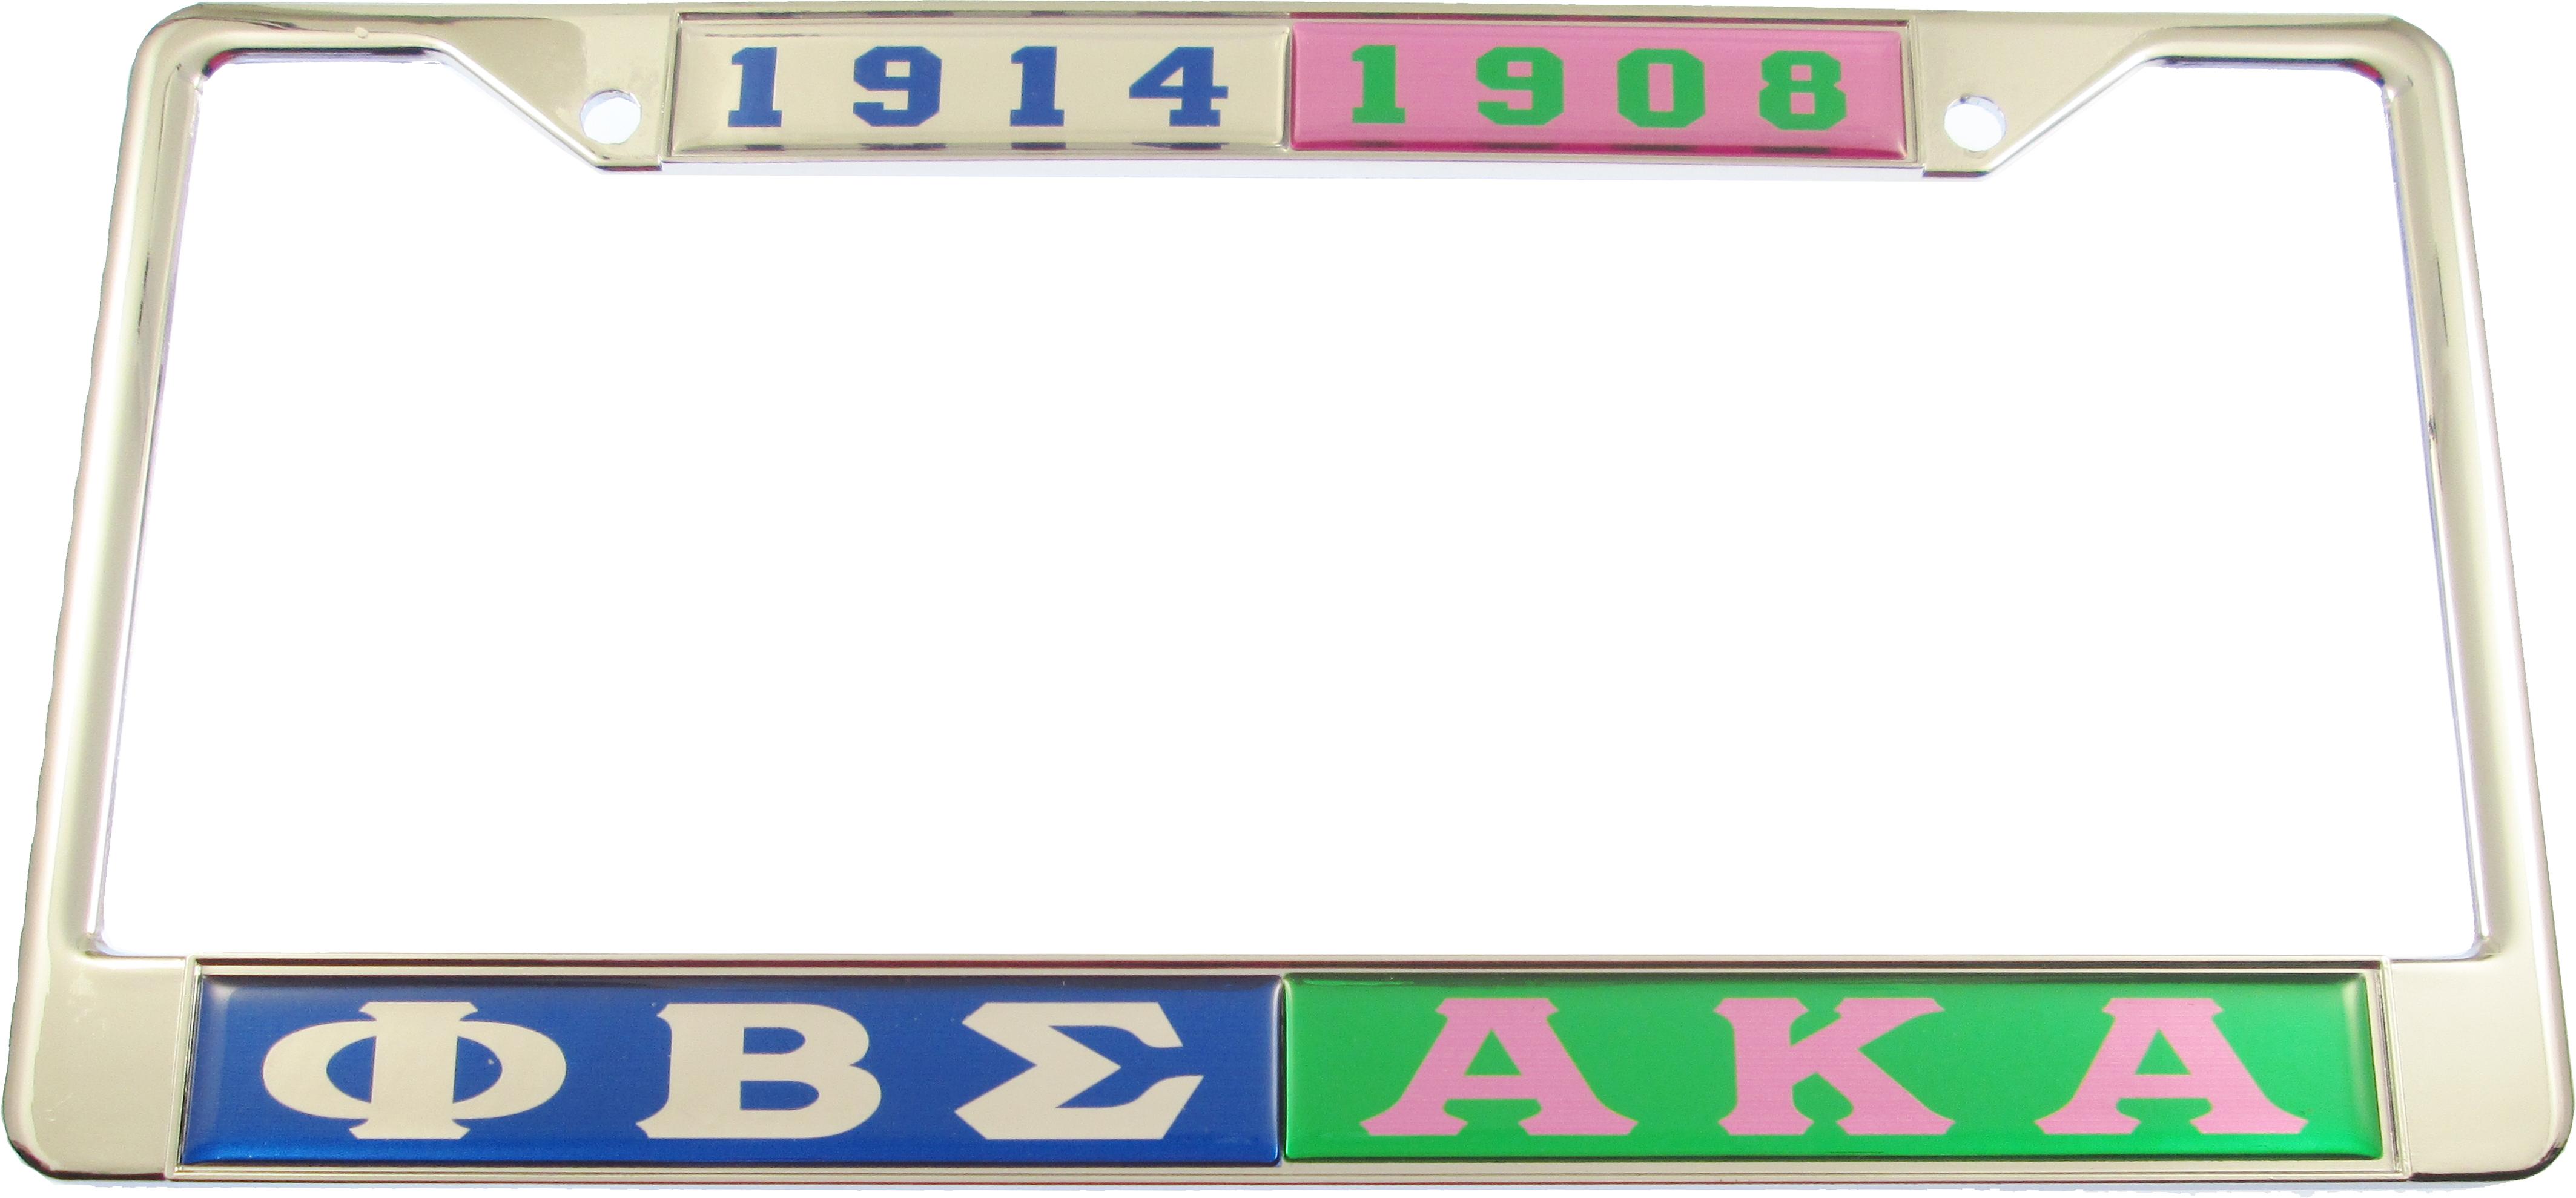 Phi Beta Sigma + Alpha Kappa Alpha Split License Plate Frame